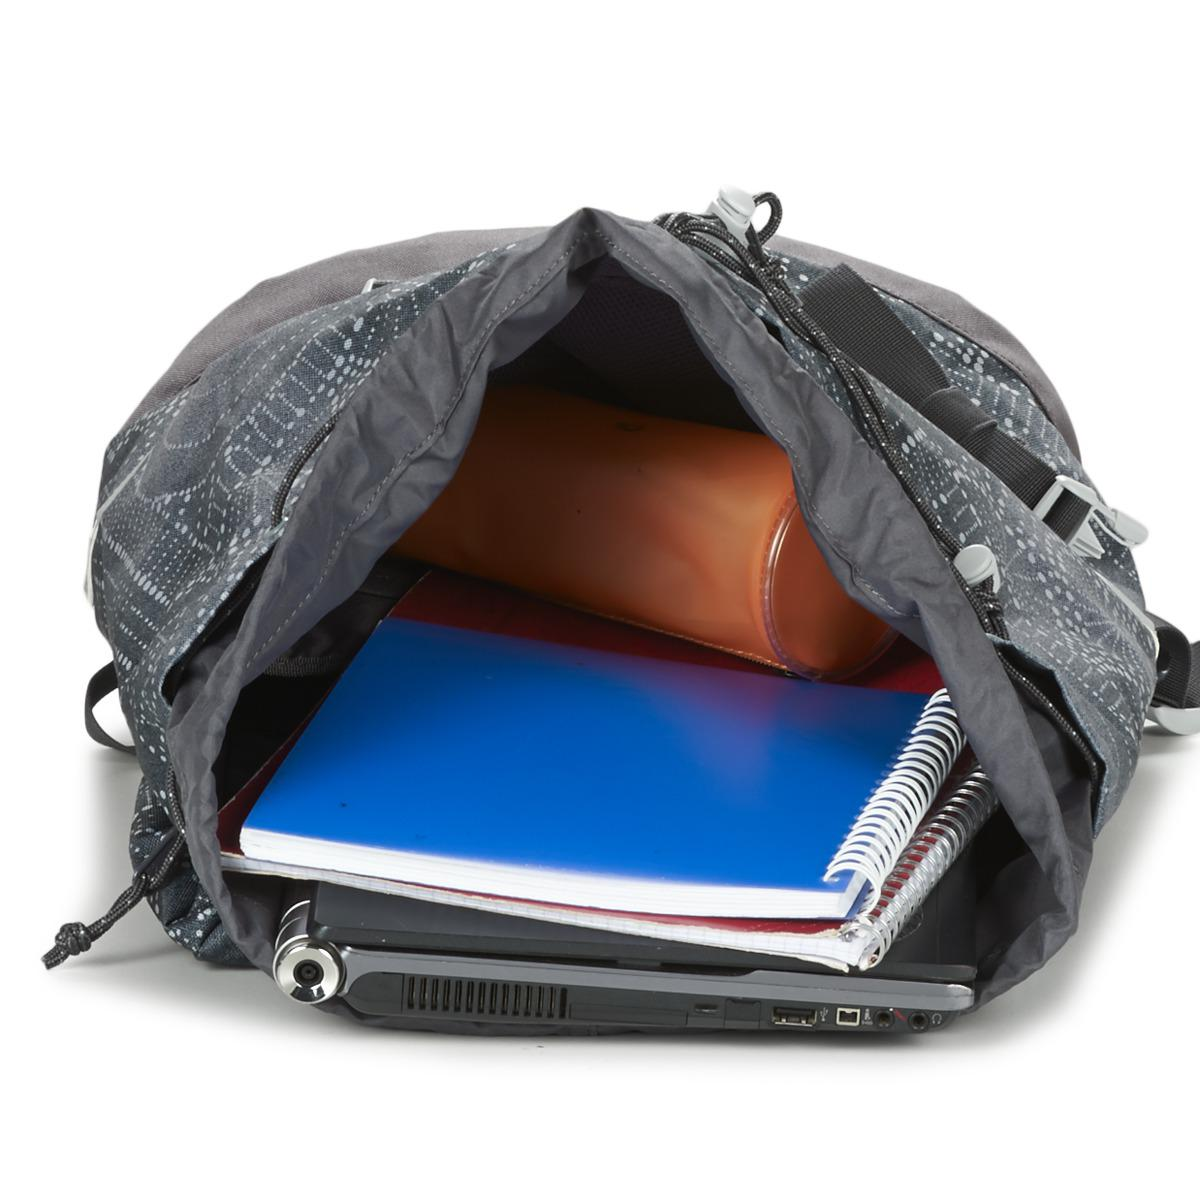 Burton Tinder Pack 25l Backpack in Grey (Grey)